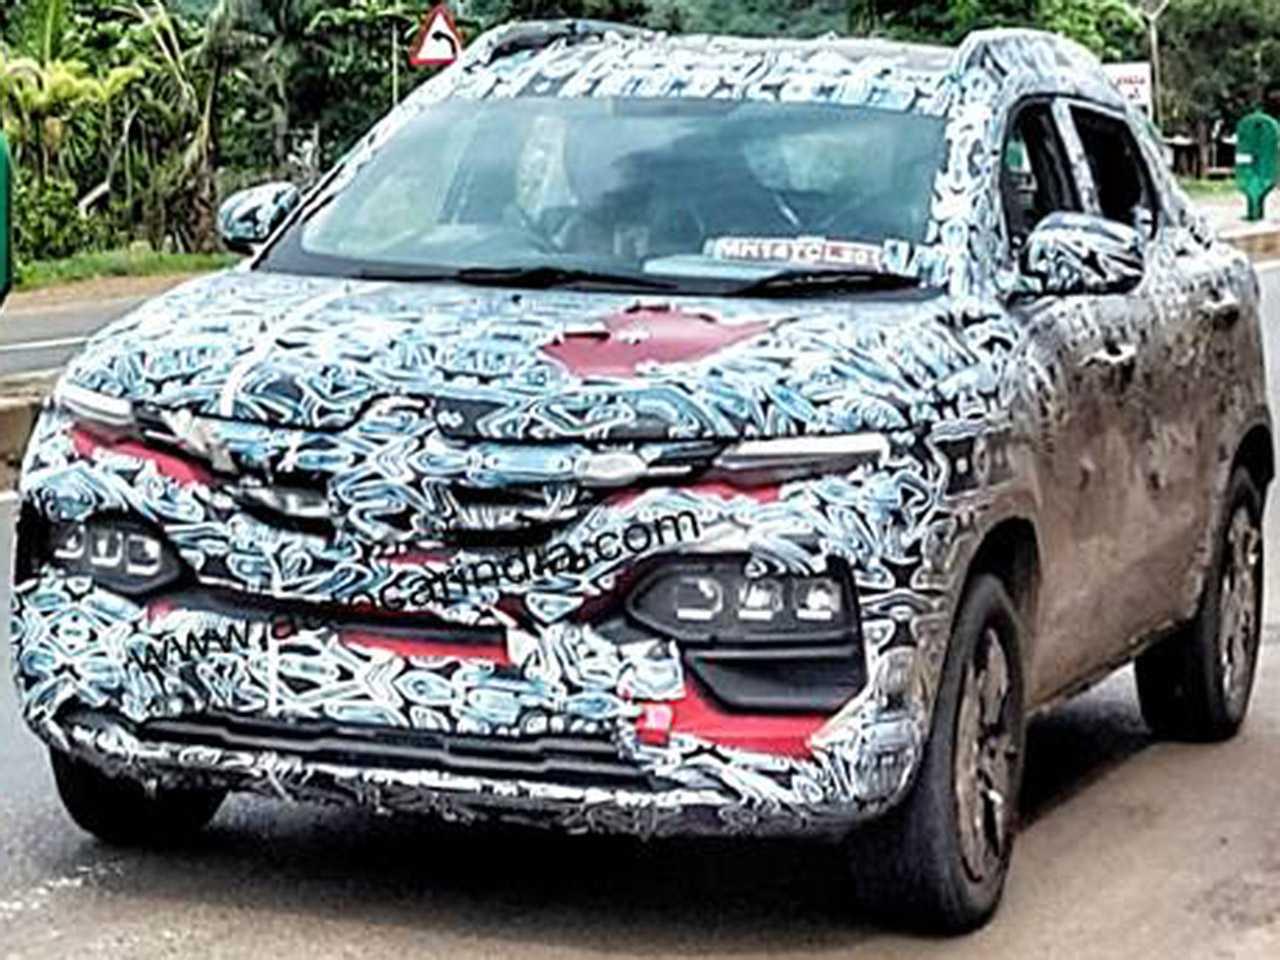 Flagra do inédito Renault Kiger em teste na Índia